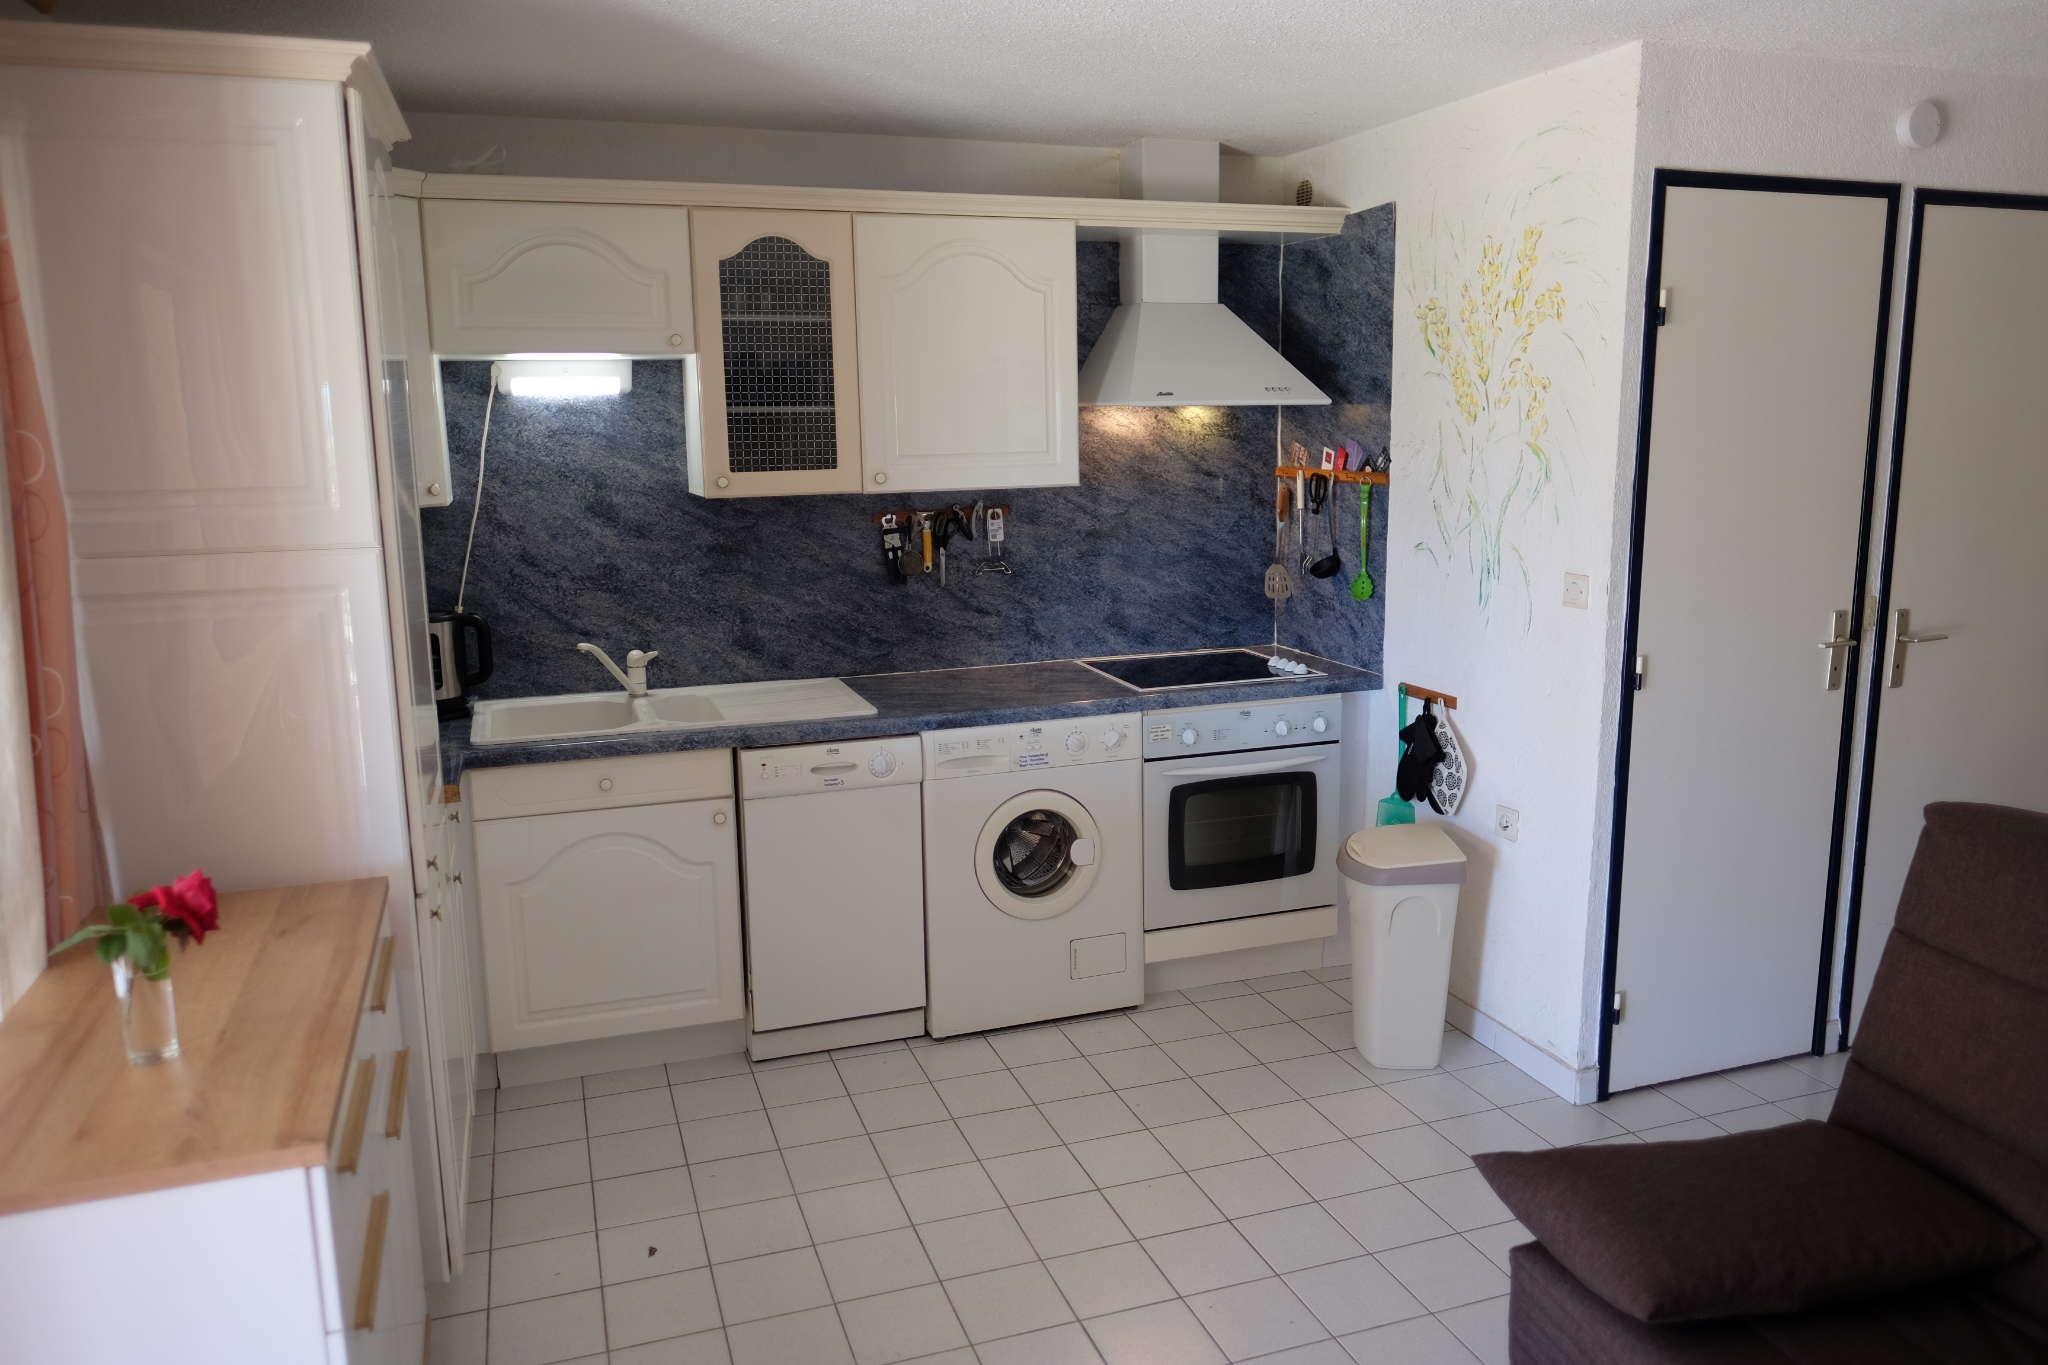 ferienwohnung 39 mers du sud 39 c 1 in gruissan les ayguades. Black Bedroom Furniture Sets. Home Design Ideas